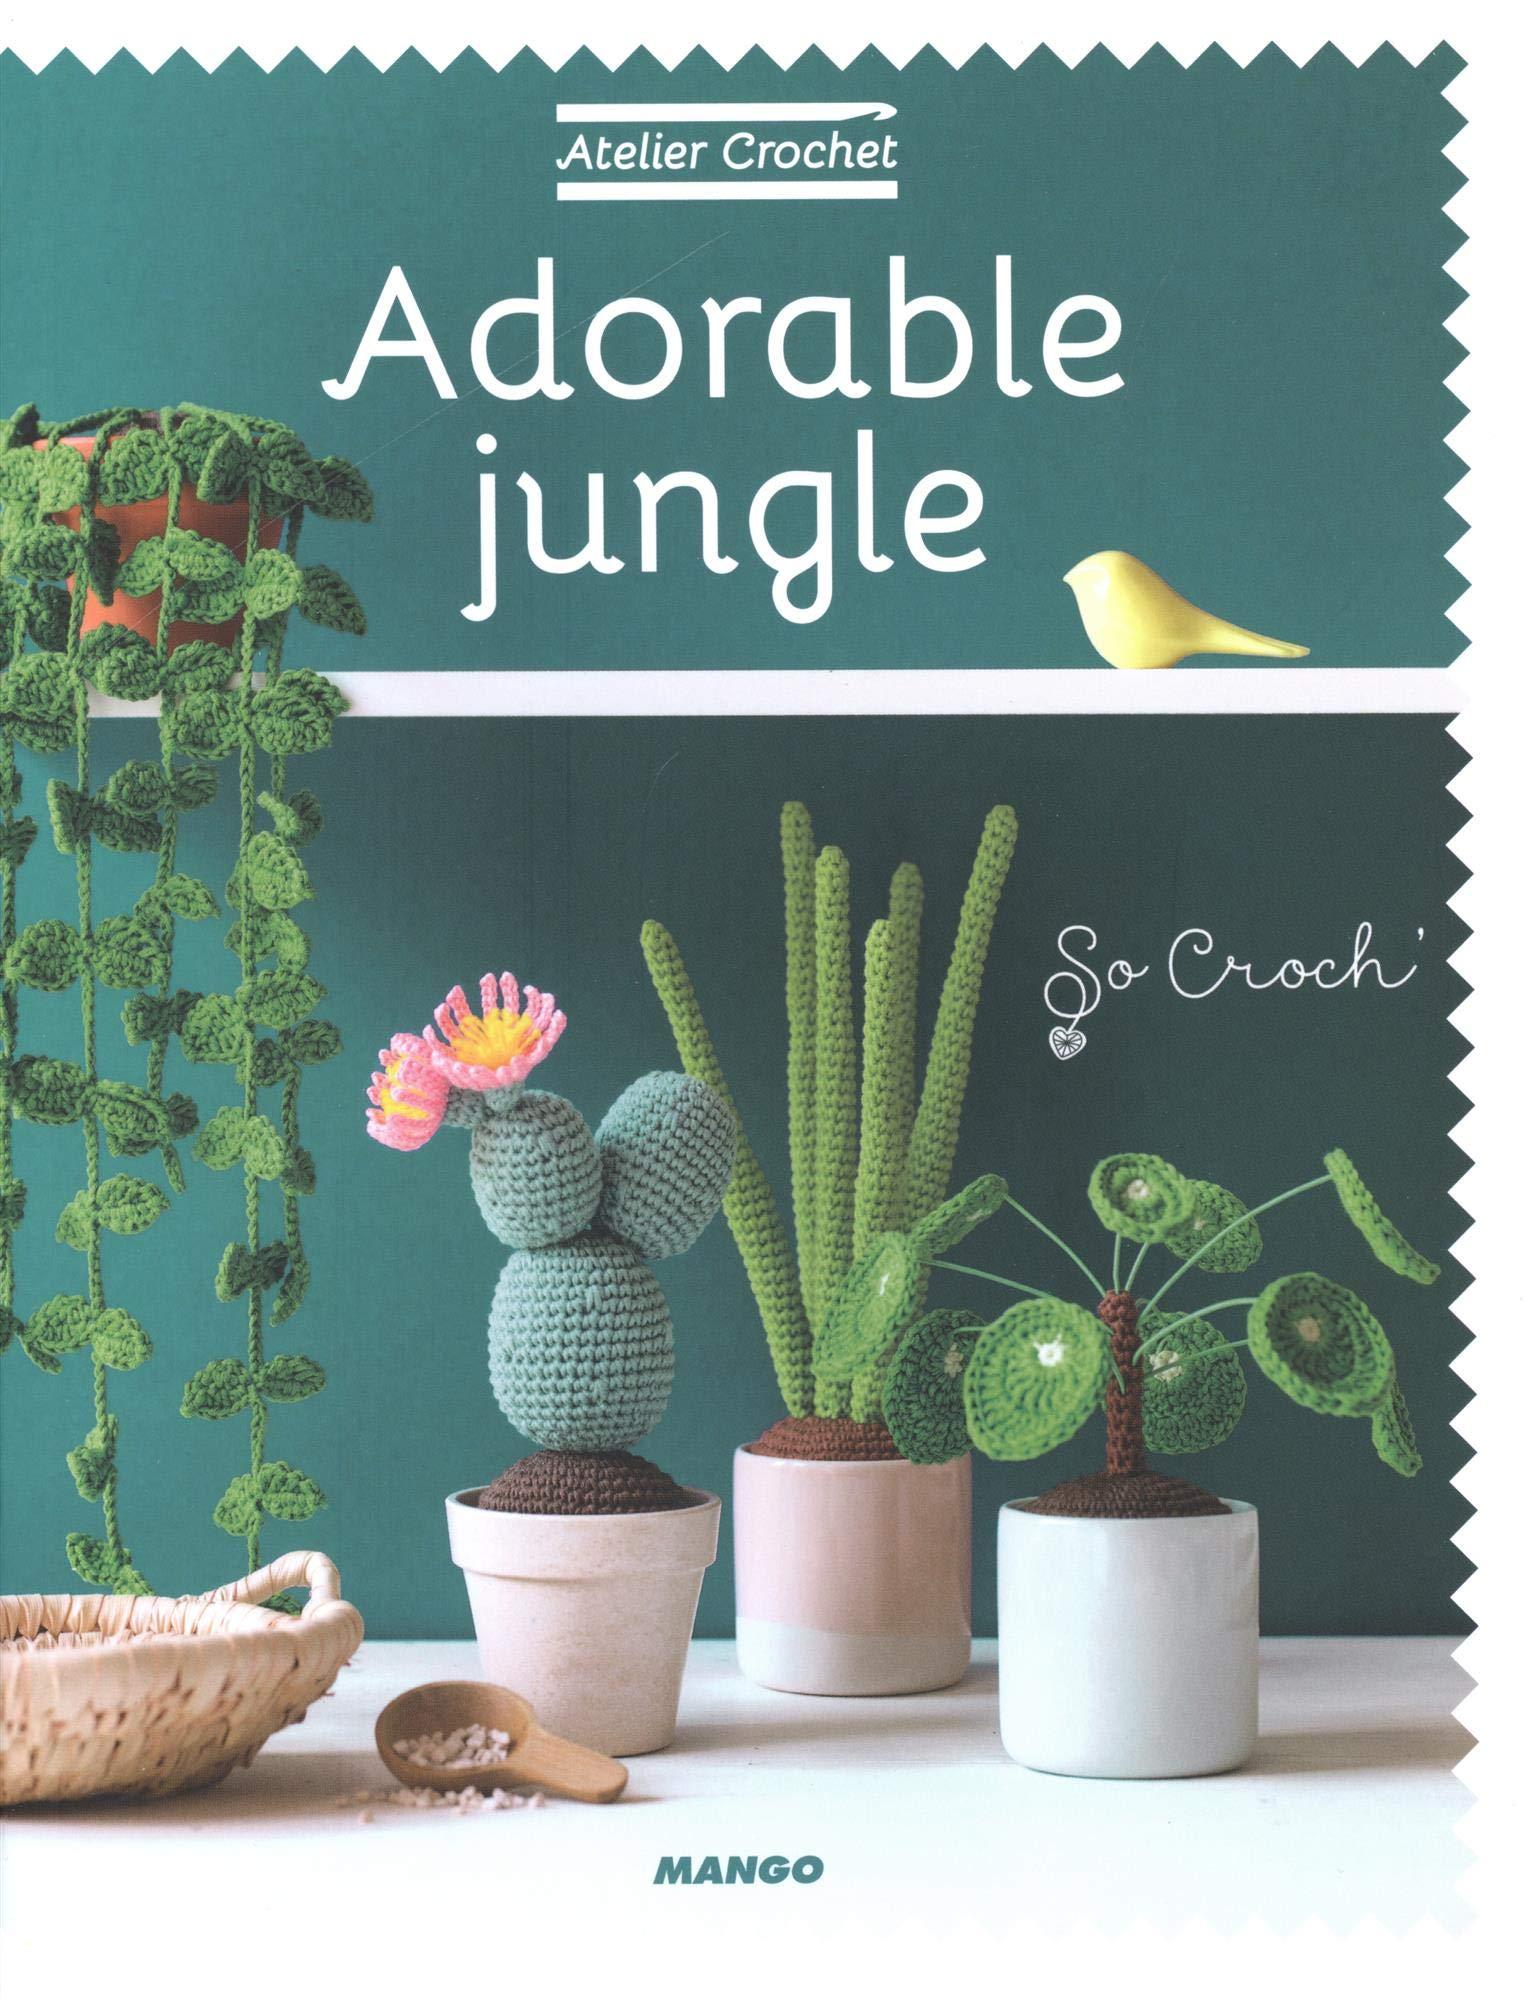 How to Make Amigurumi Crochet Kawaii Cactus.Make these and never ... | 2000x1526